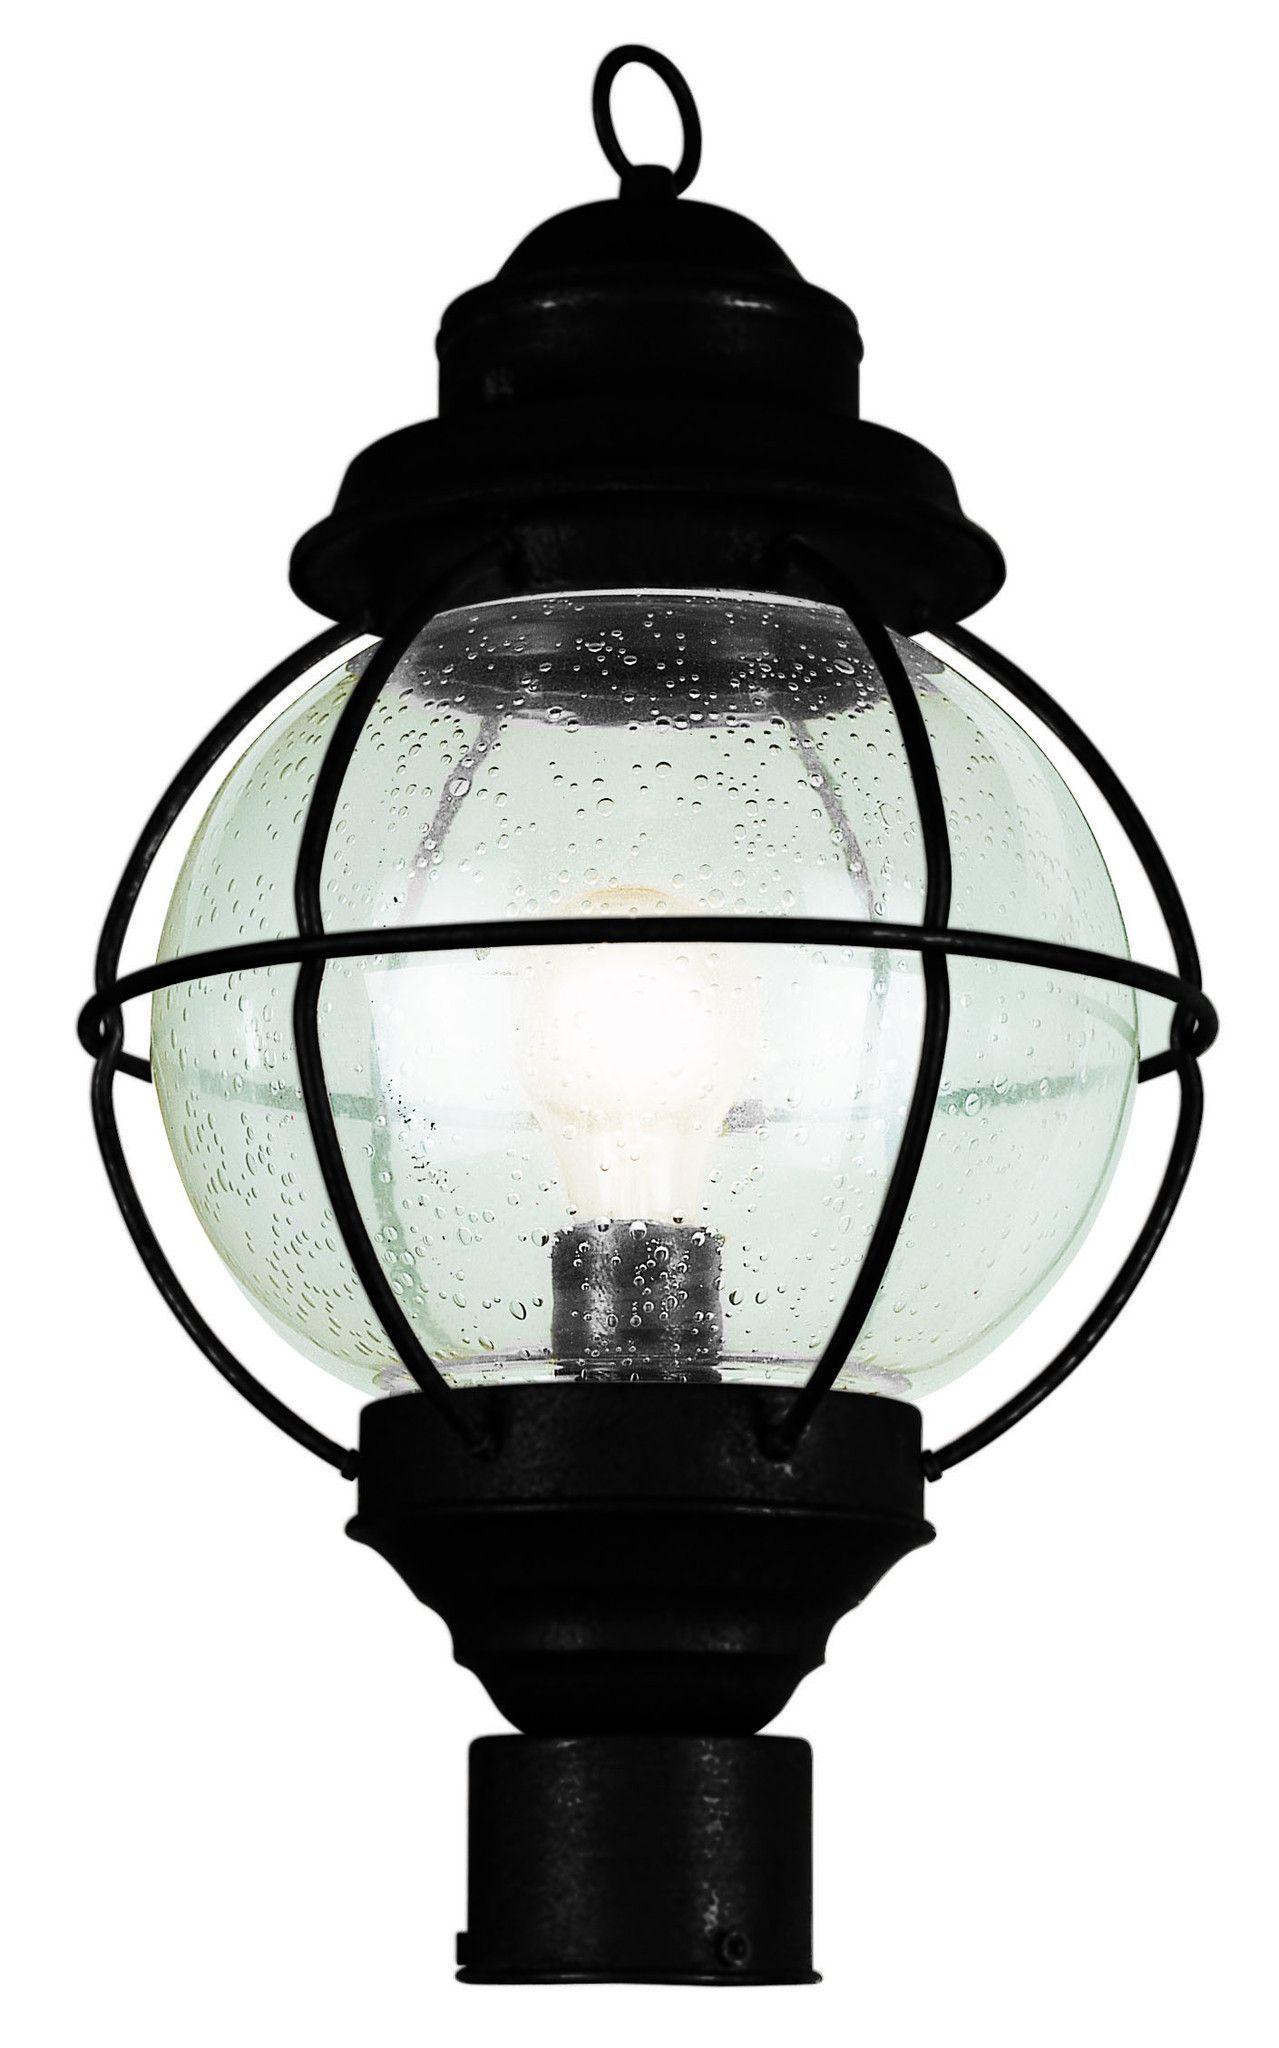 Trans globe lighting 69902 bk onion lantern post top 15 black trans globe lighting 69902 bk onion lantern post top 15 black arubaitofo Choice Image